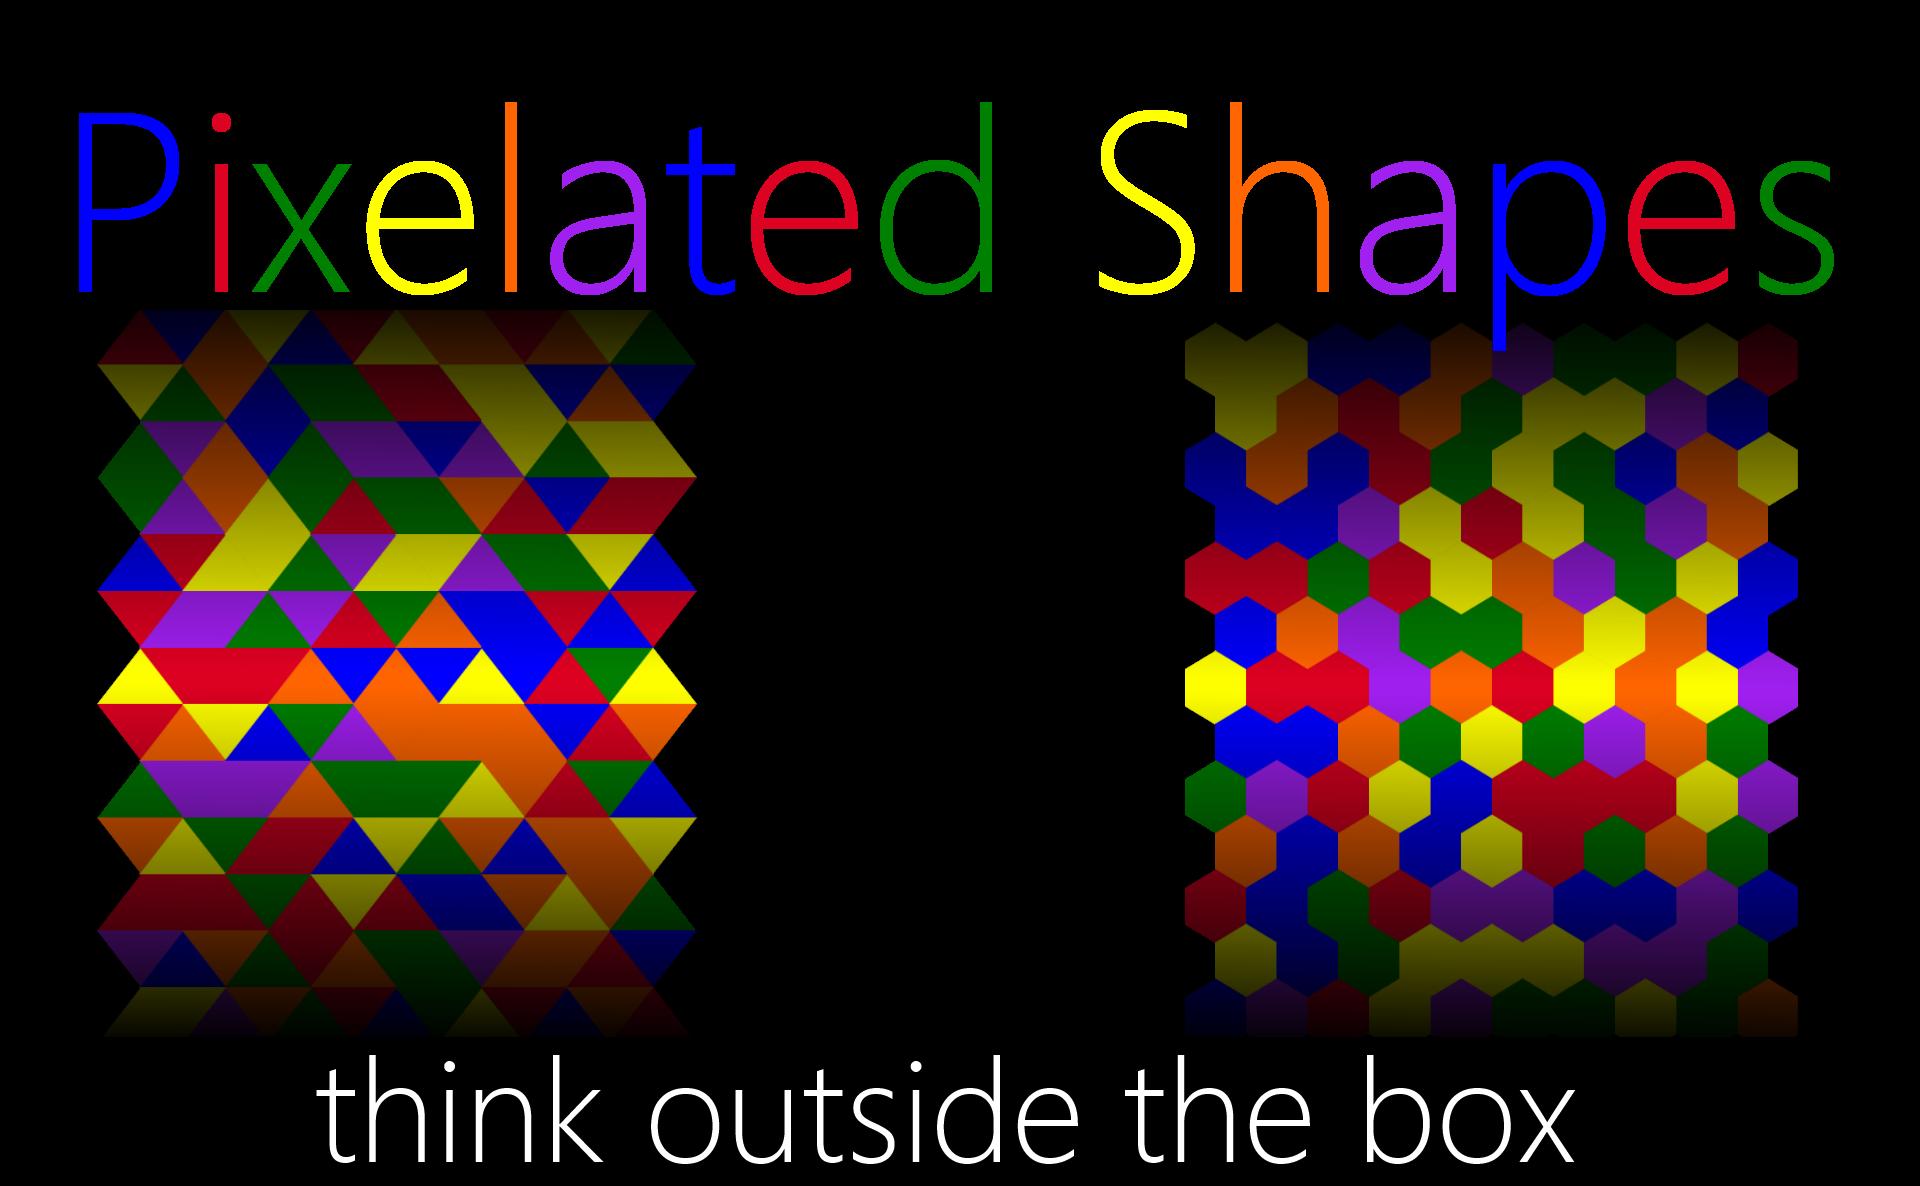 PixelatedShapes